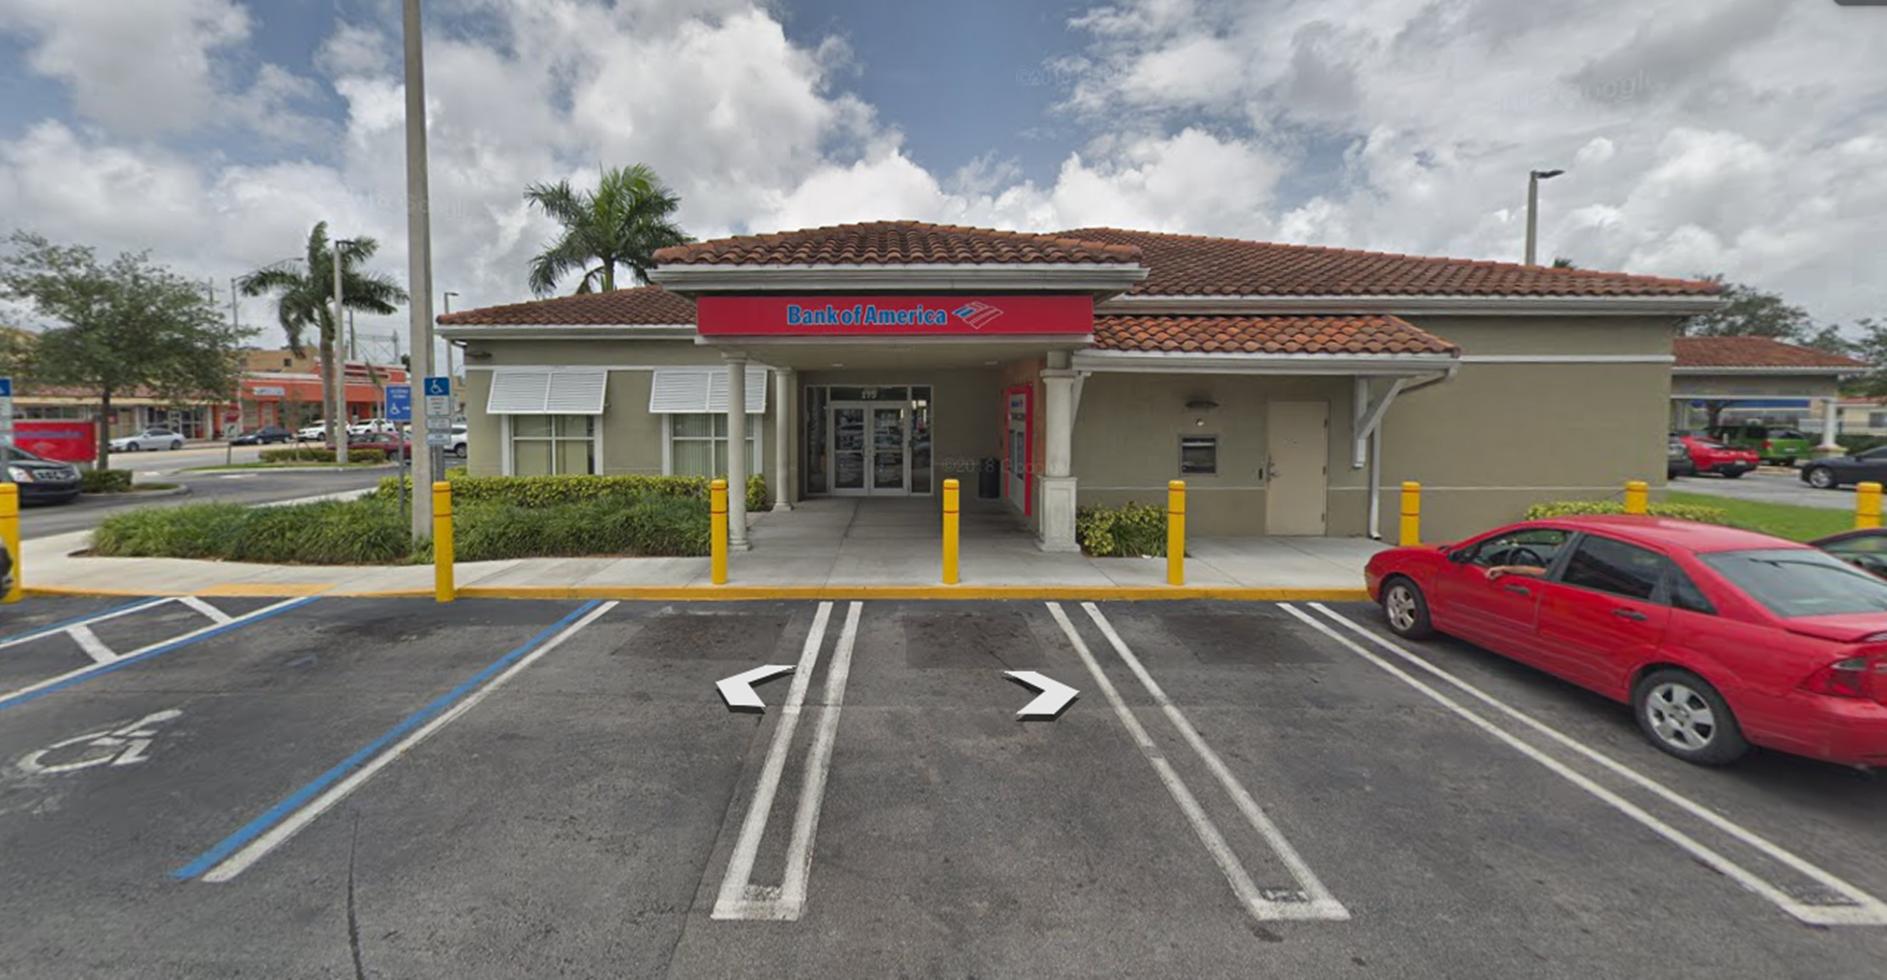 Bank of America financial center with drive-thru ATM | 175 E Hialeah Dr, Hialeah, FL 33010